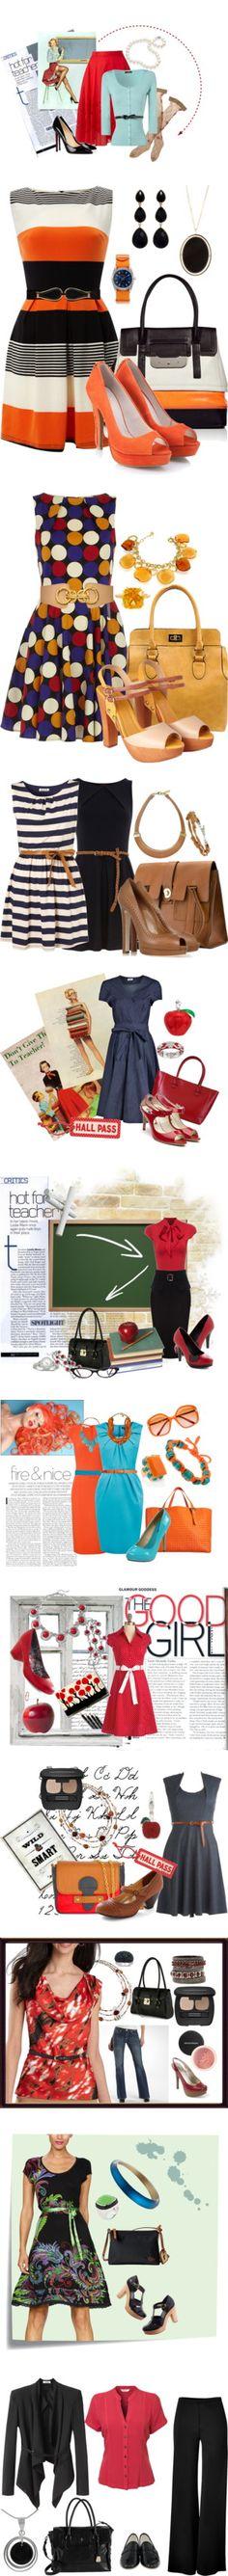 """Teacher Clothes"" by missteacherlady on Polyvore"